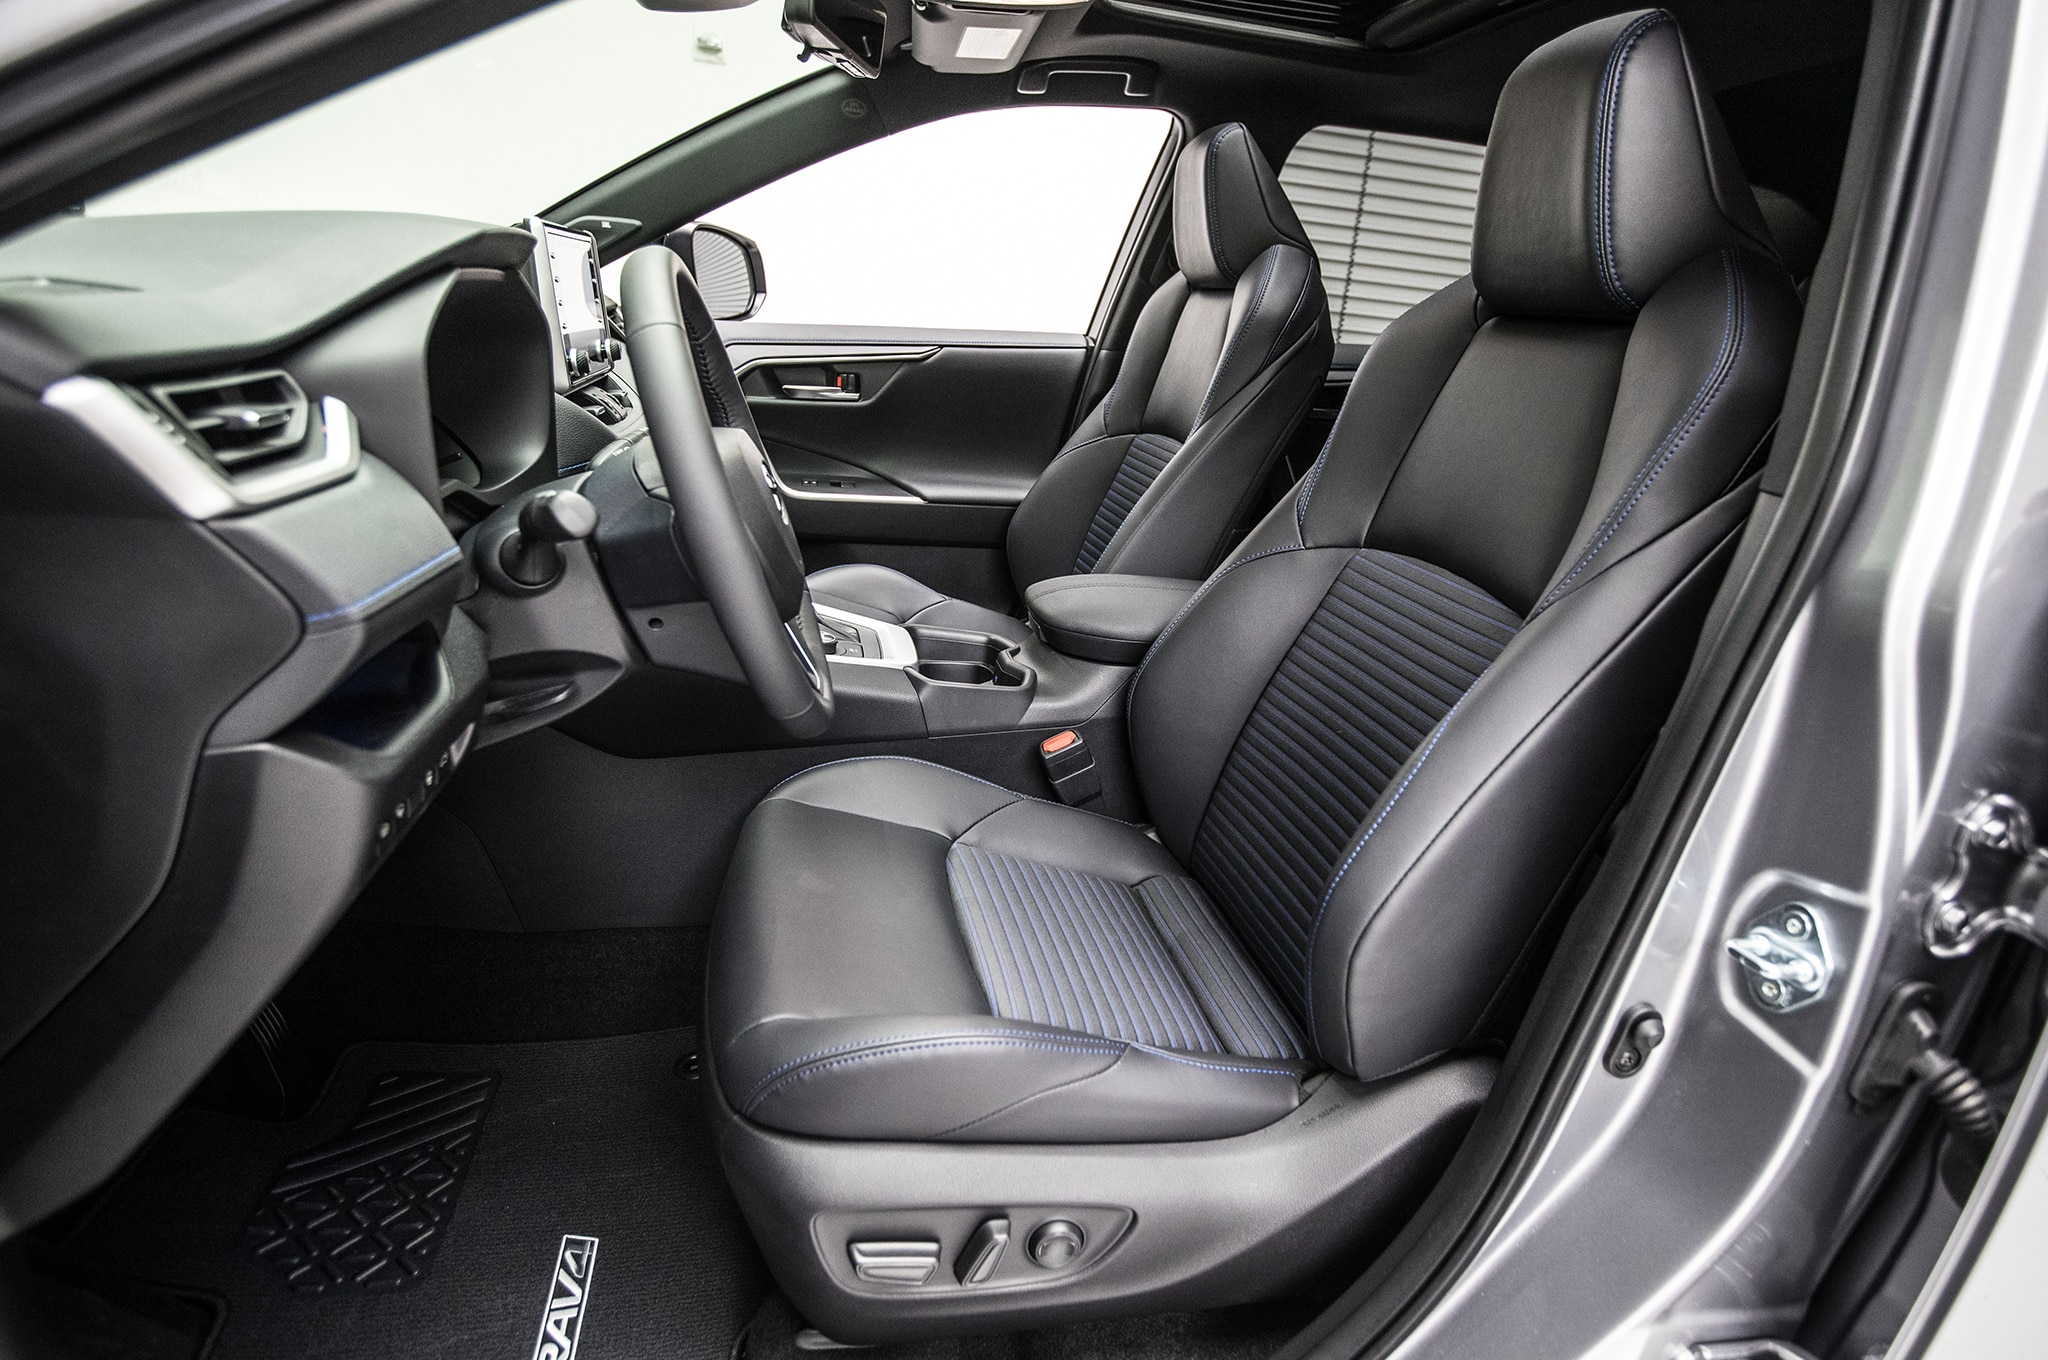 2019 Toyota RAV4 Hybrid front interior seats 1 - Motor ...